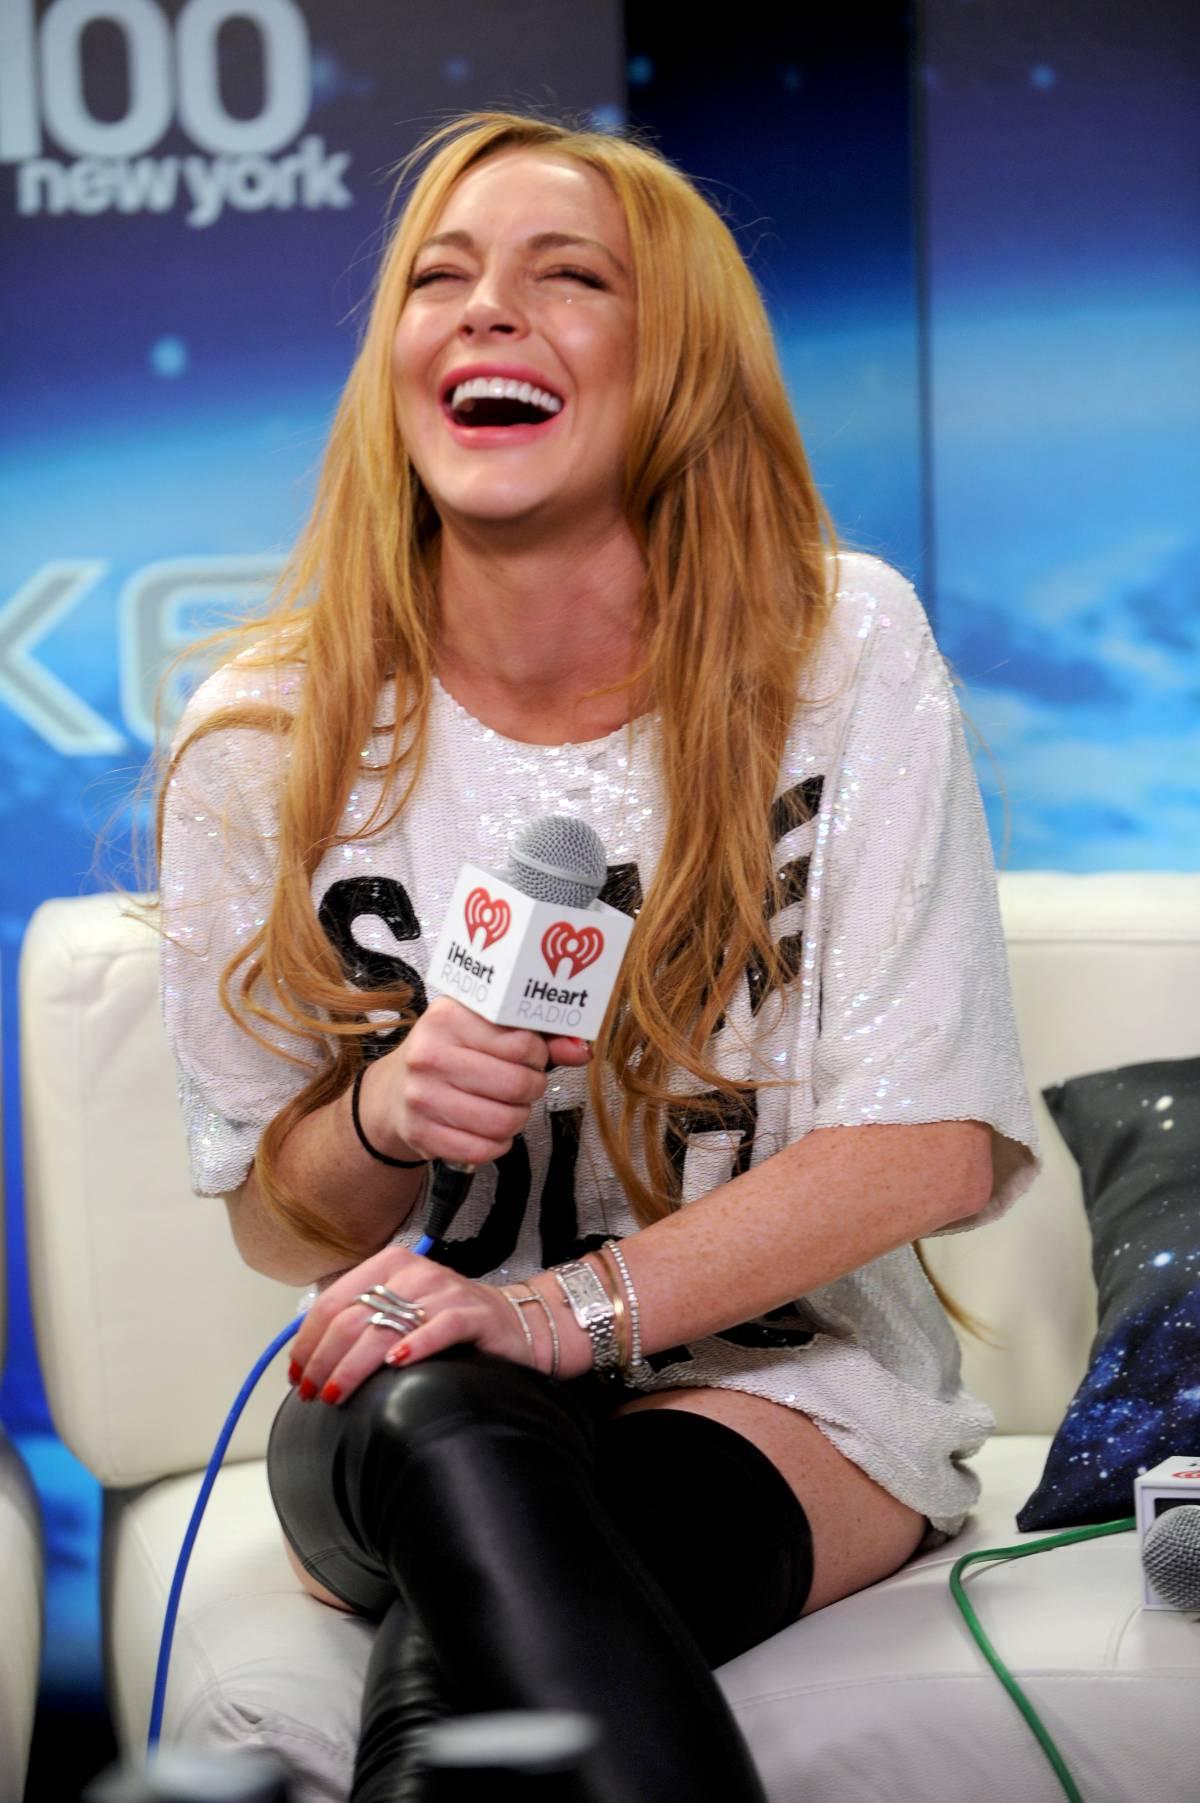 Lindsay Lohan: Z100s Jingle Ball 2013 -05 – GotCeleb